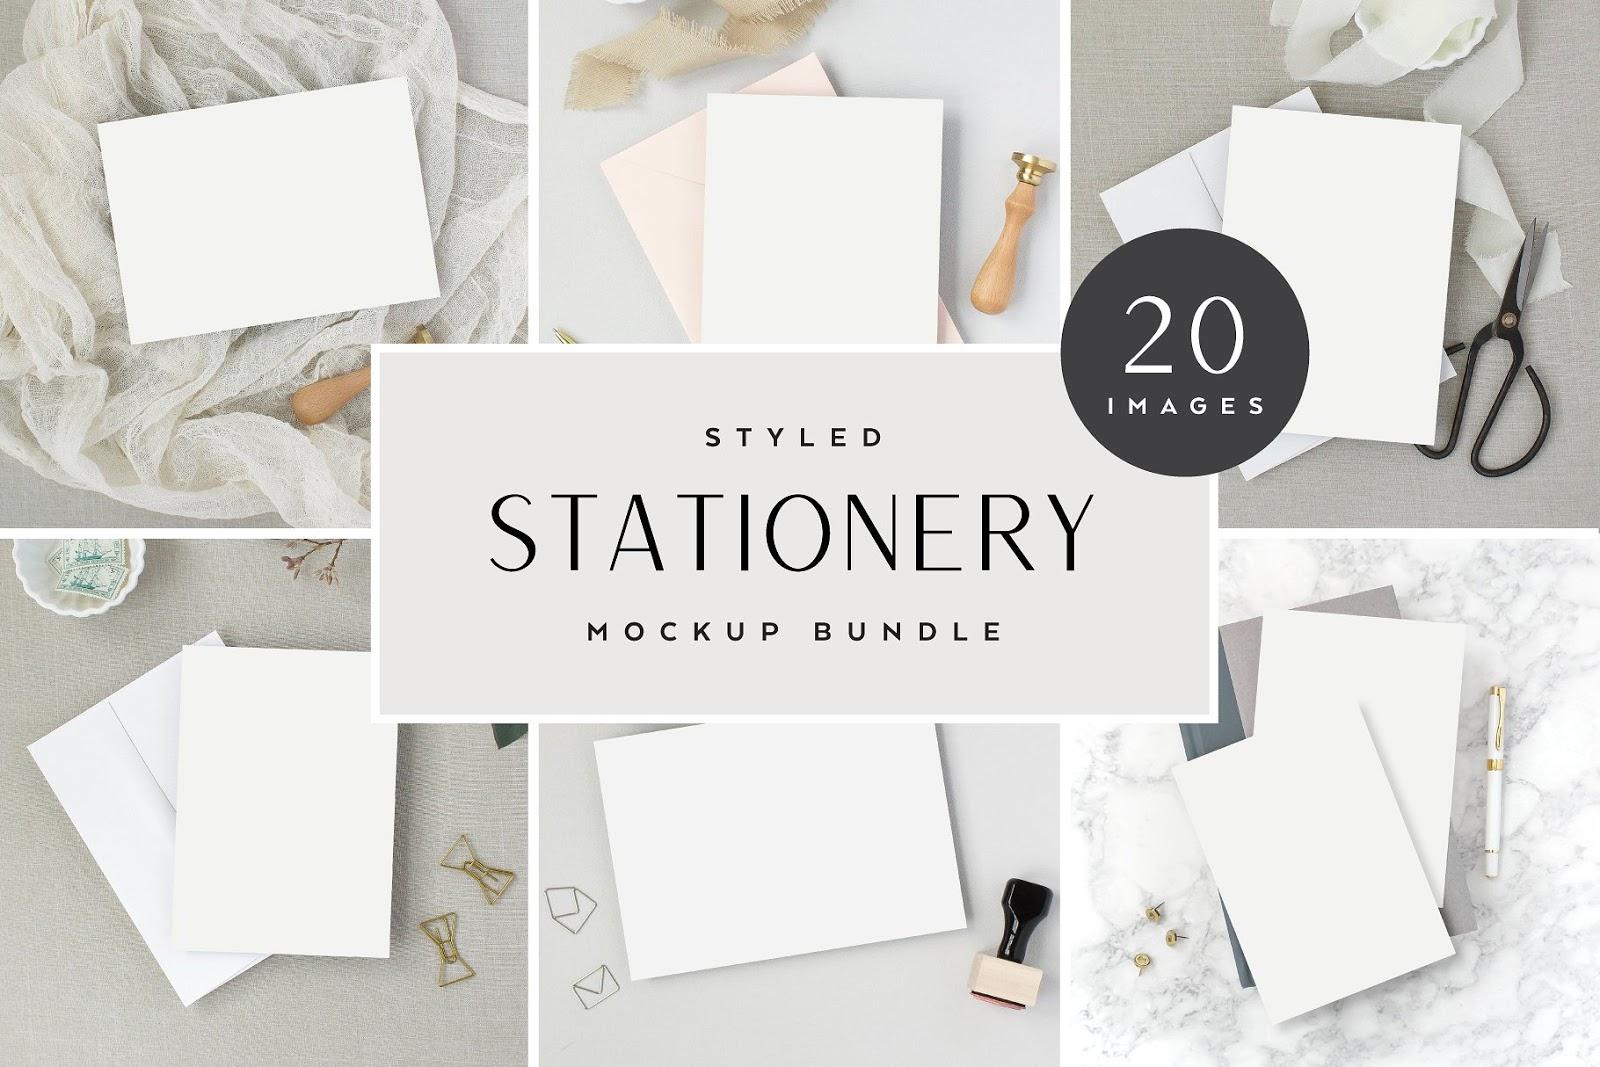 Neutral Styled Stationery Mockups